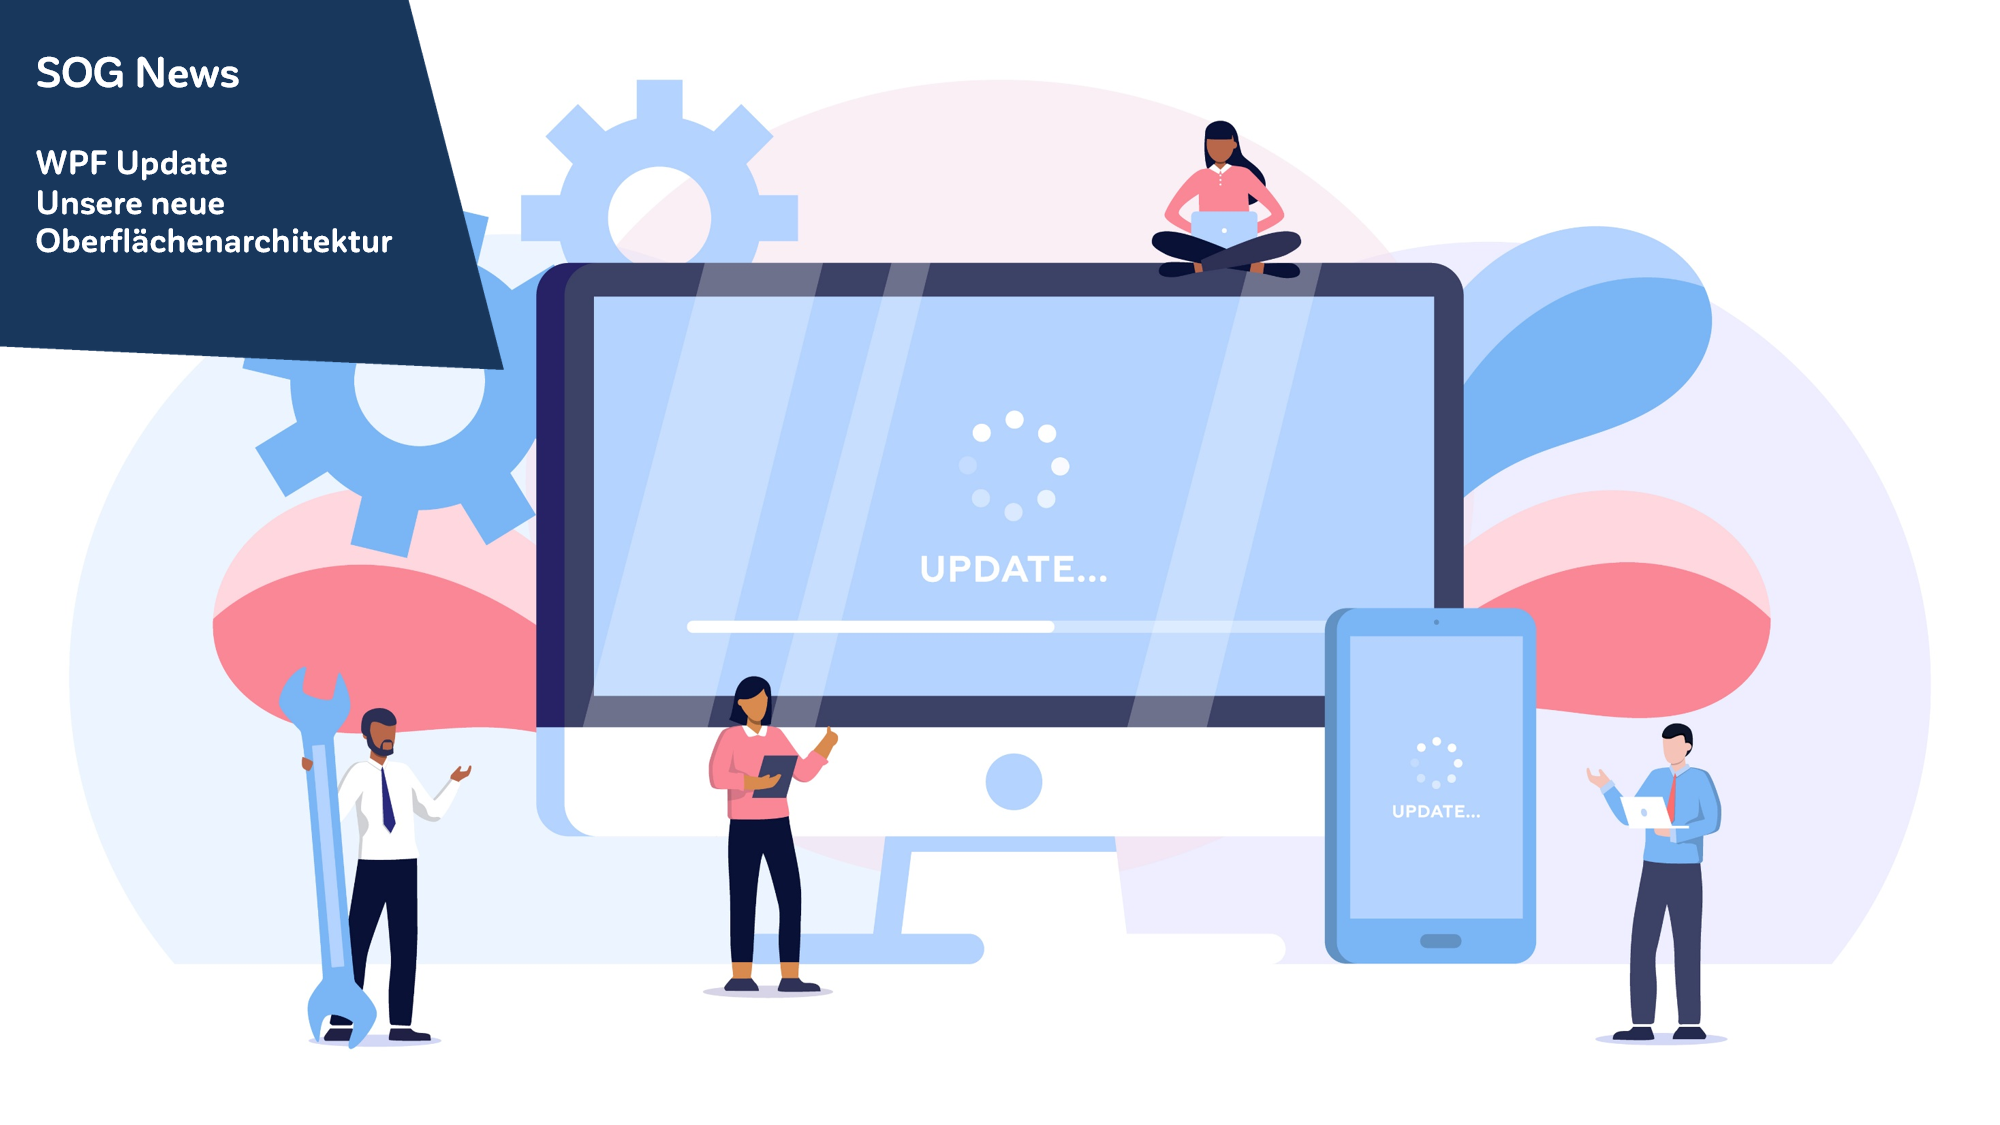 SOG News WPF Update